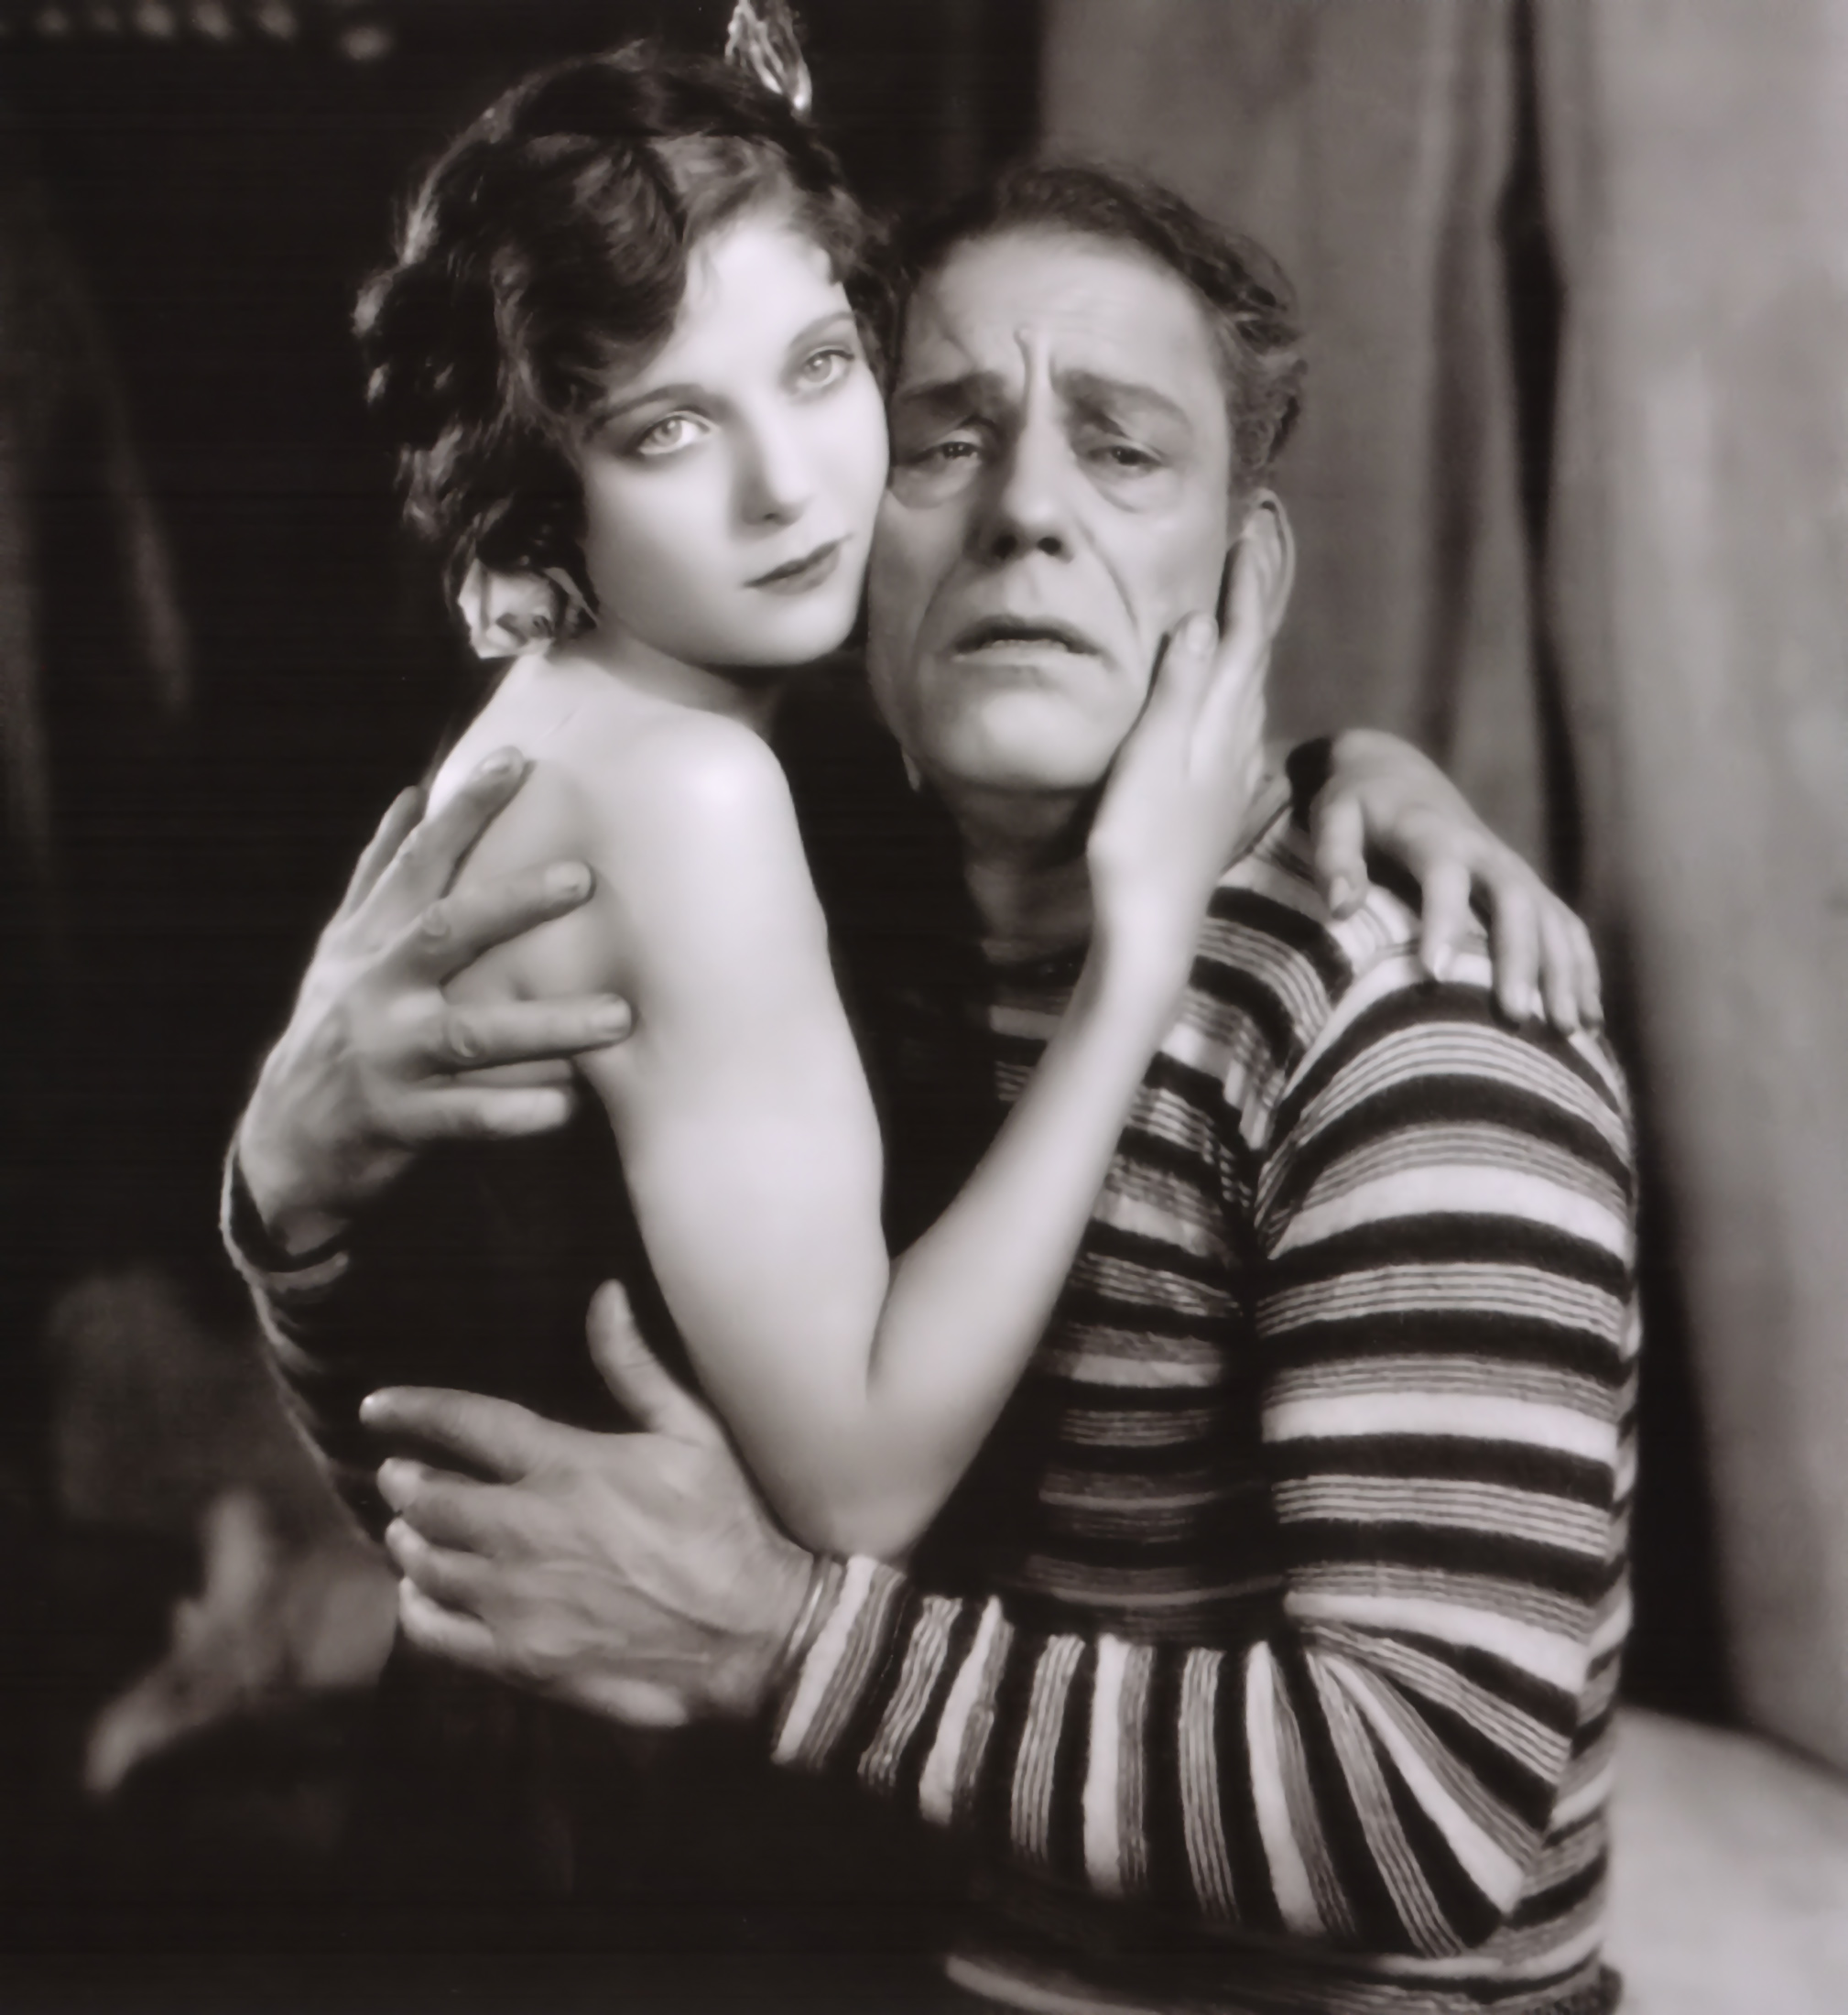 Anulka Dziubinska,Eleanor Powell Erotic gallery Mary Anderson (actress, born 1918),Gabrielle Scollay